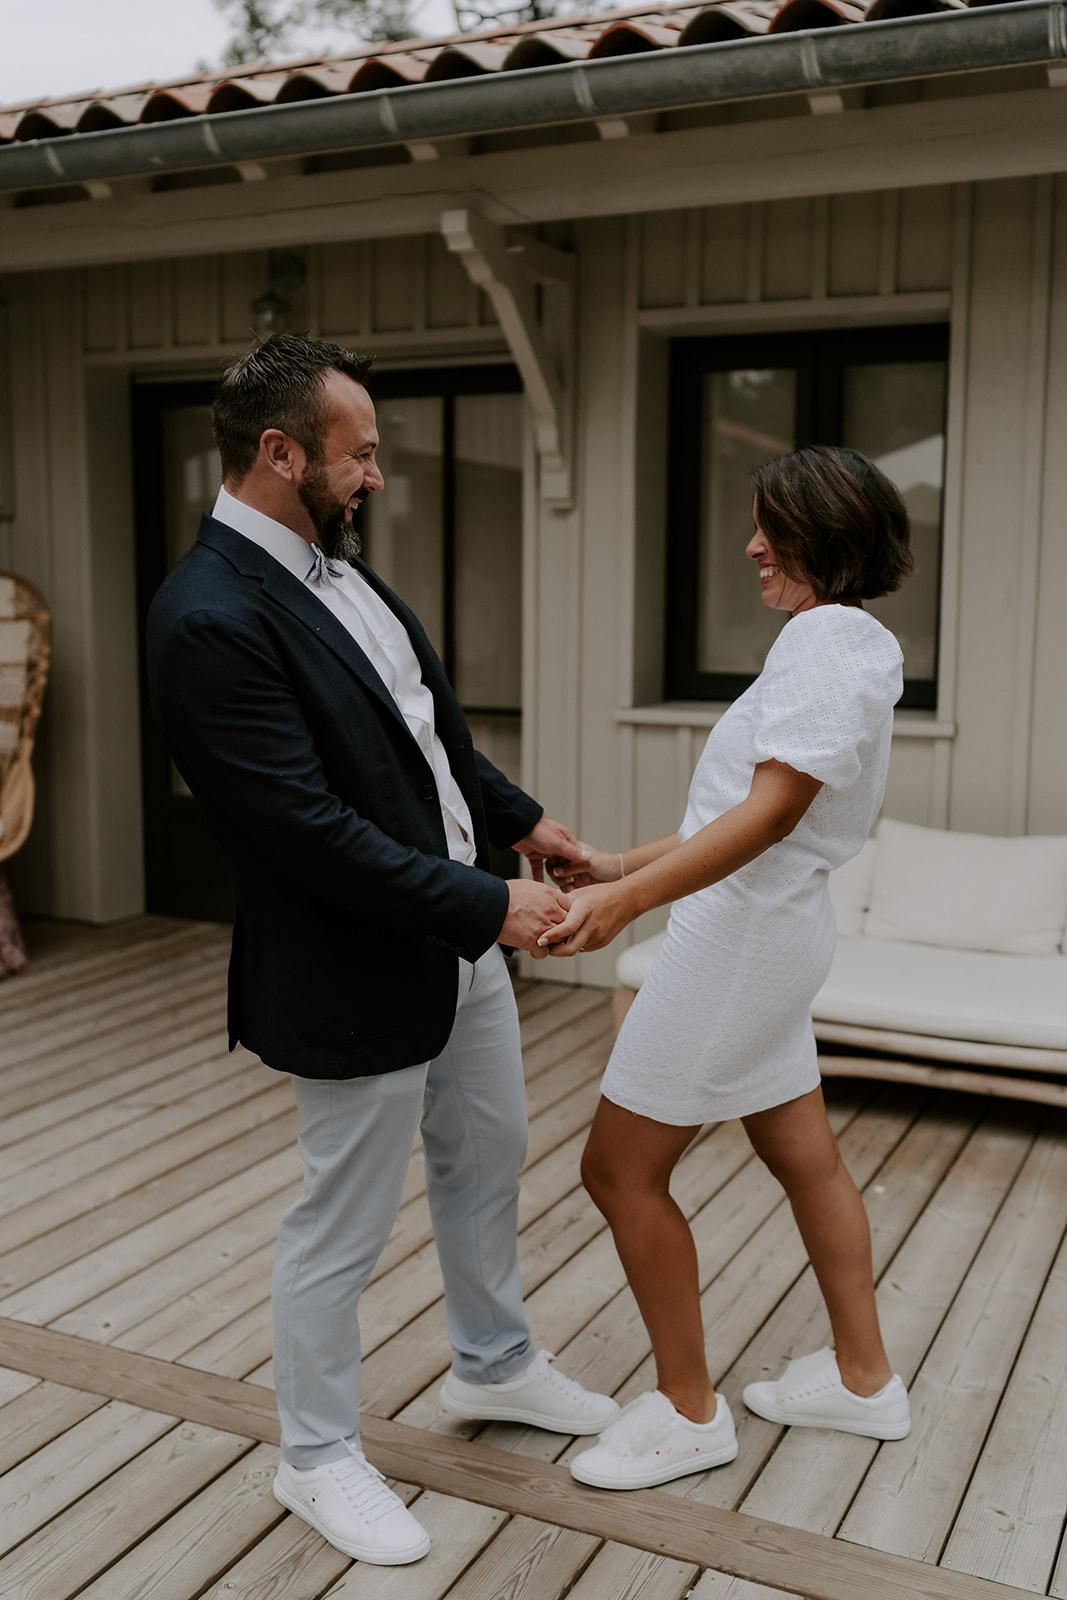 bassin-Arcachon-intimiste-revelation-couple-heureux-avant-ceremonie